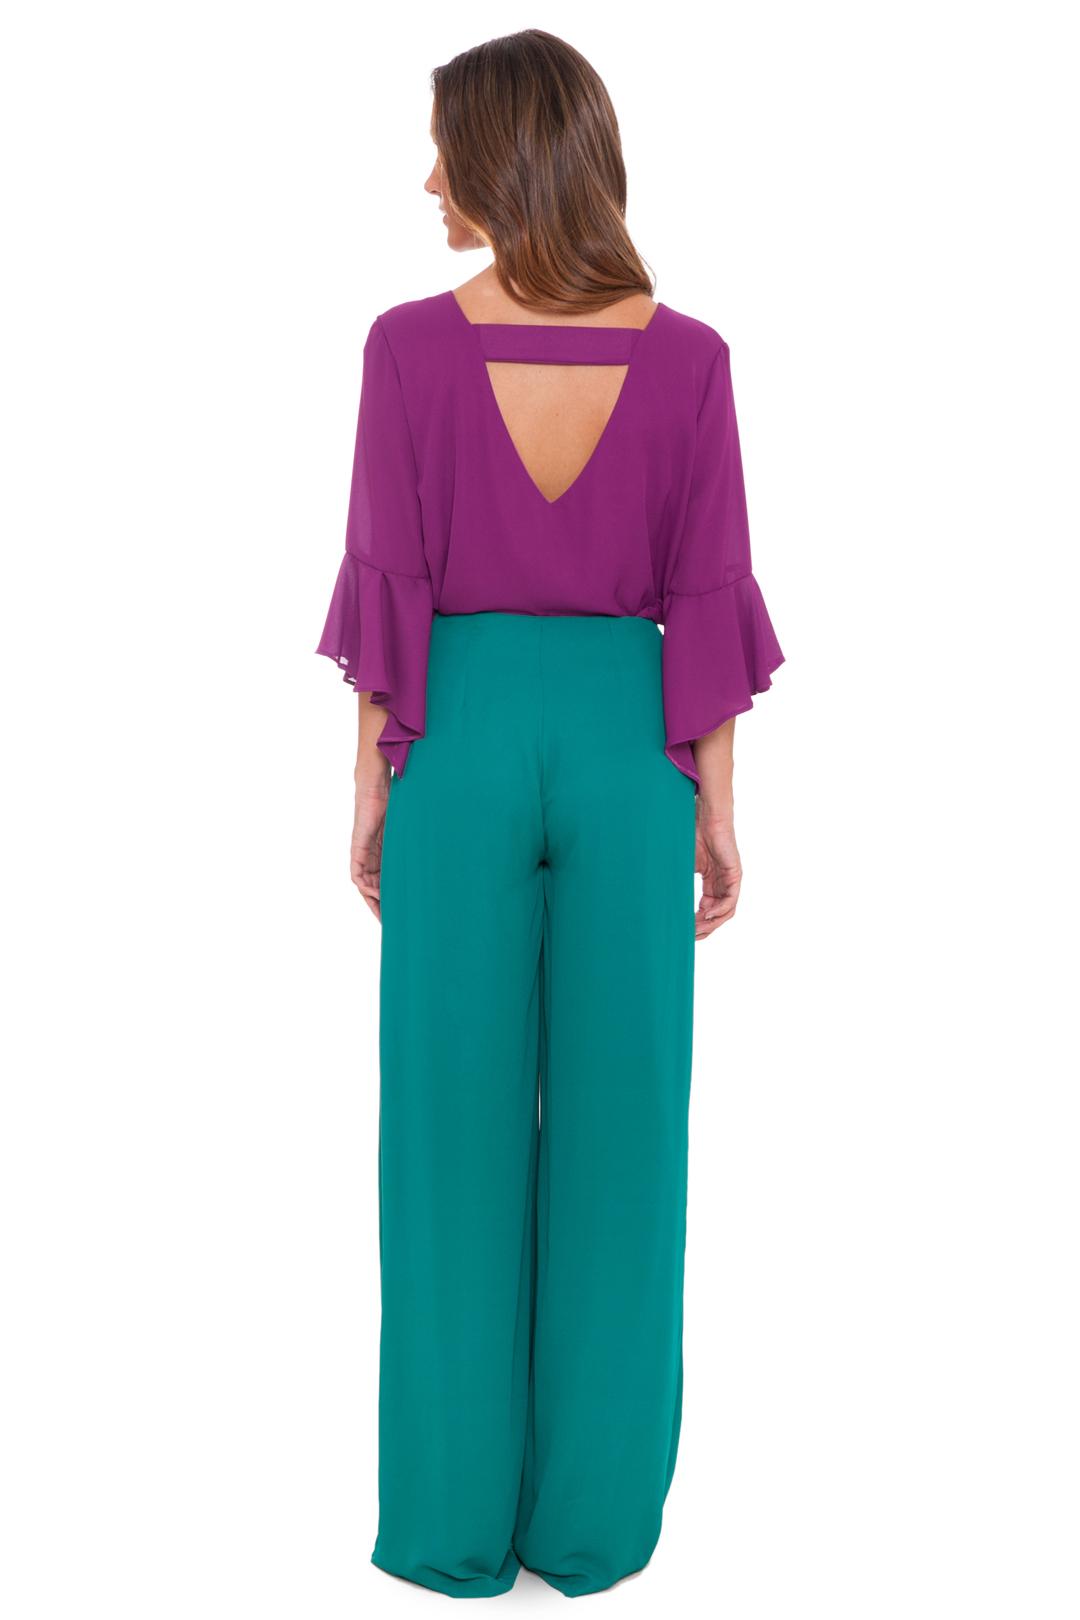 left - Camisa Purple Campana